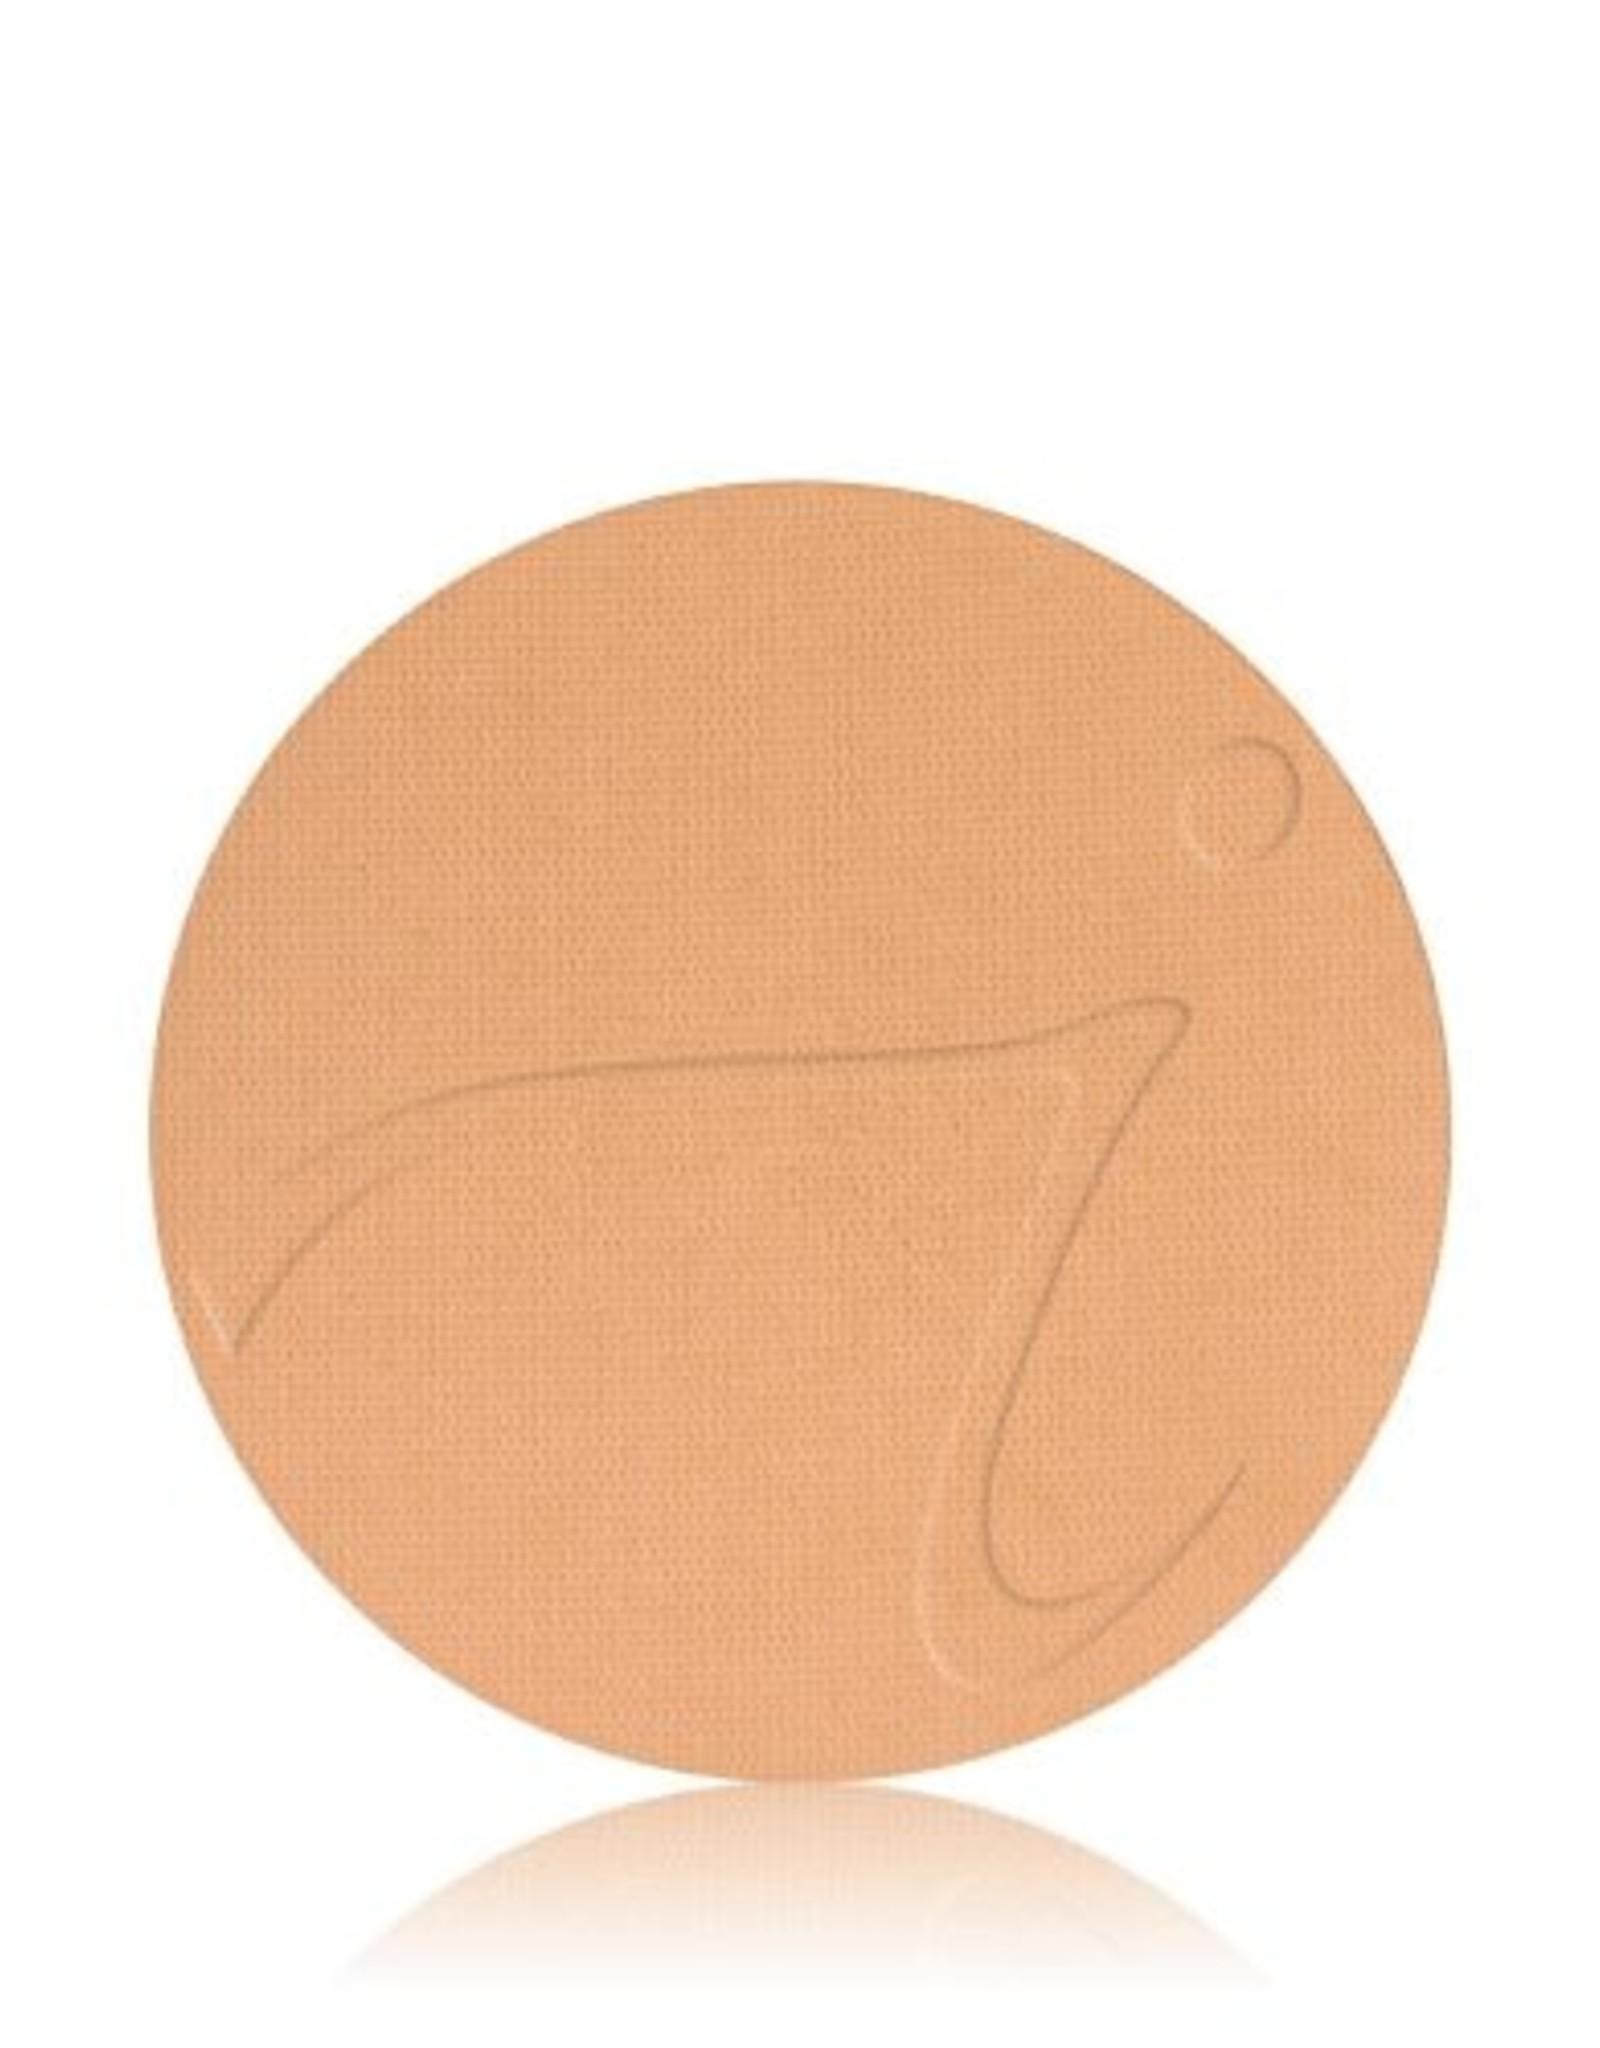 Jane Iredale Pure Pressed Base Refill | Medium - Medium Dark